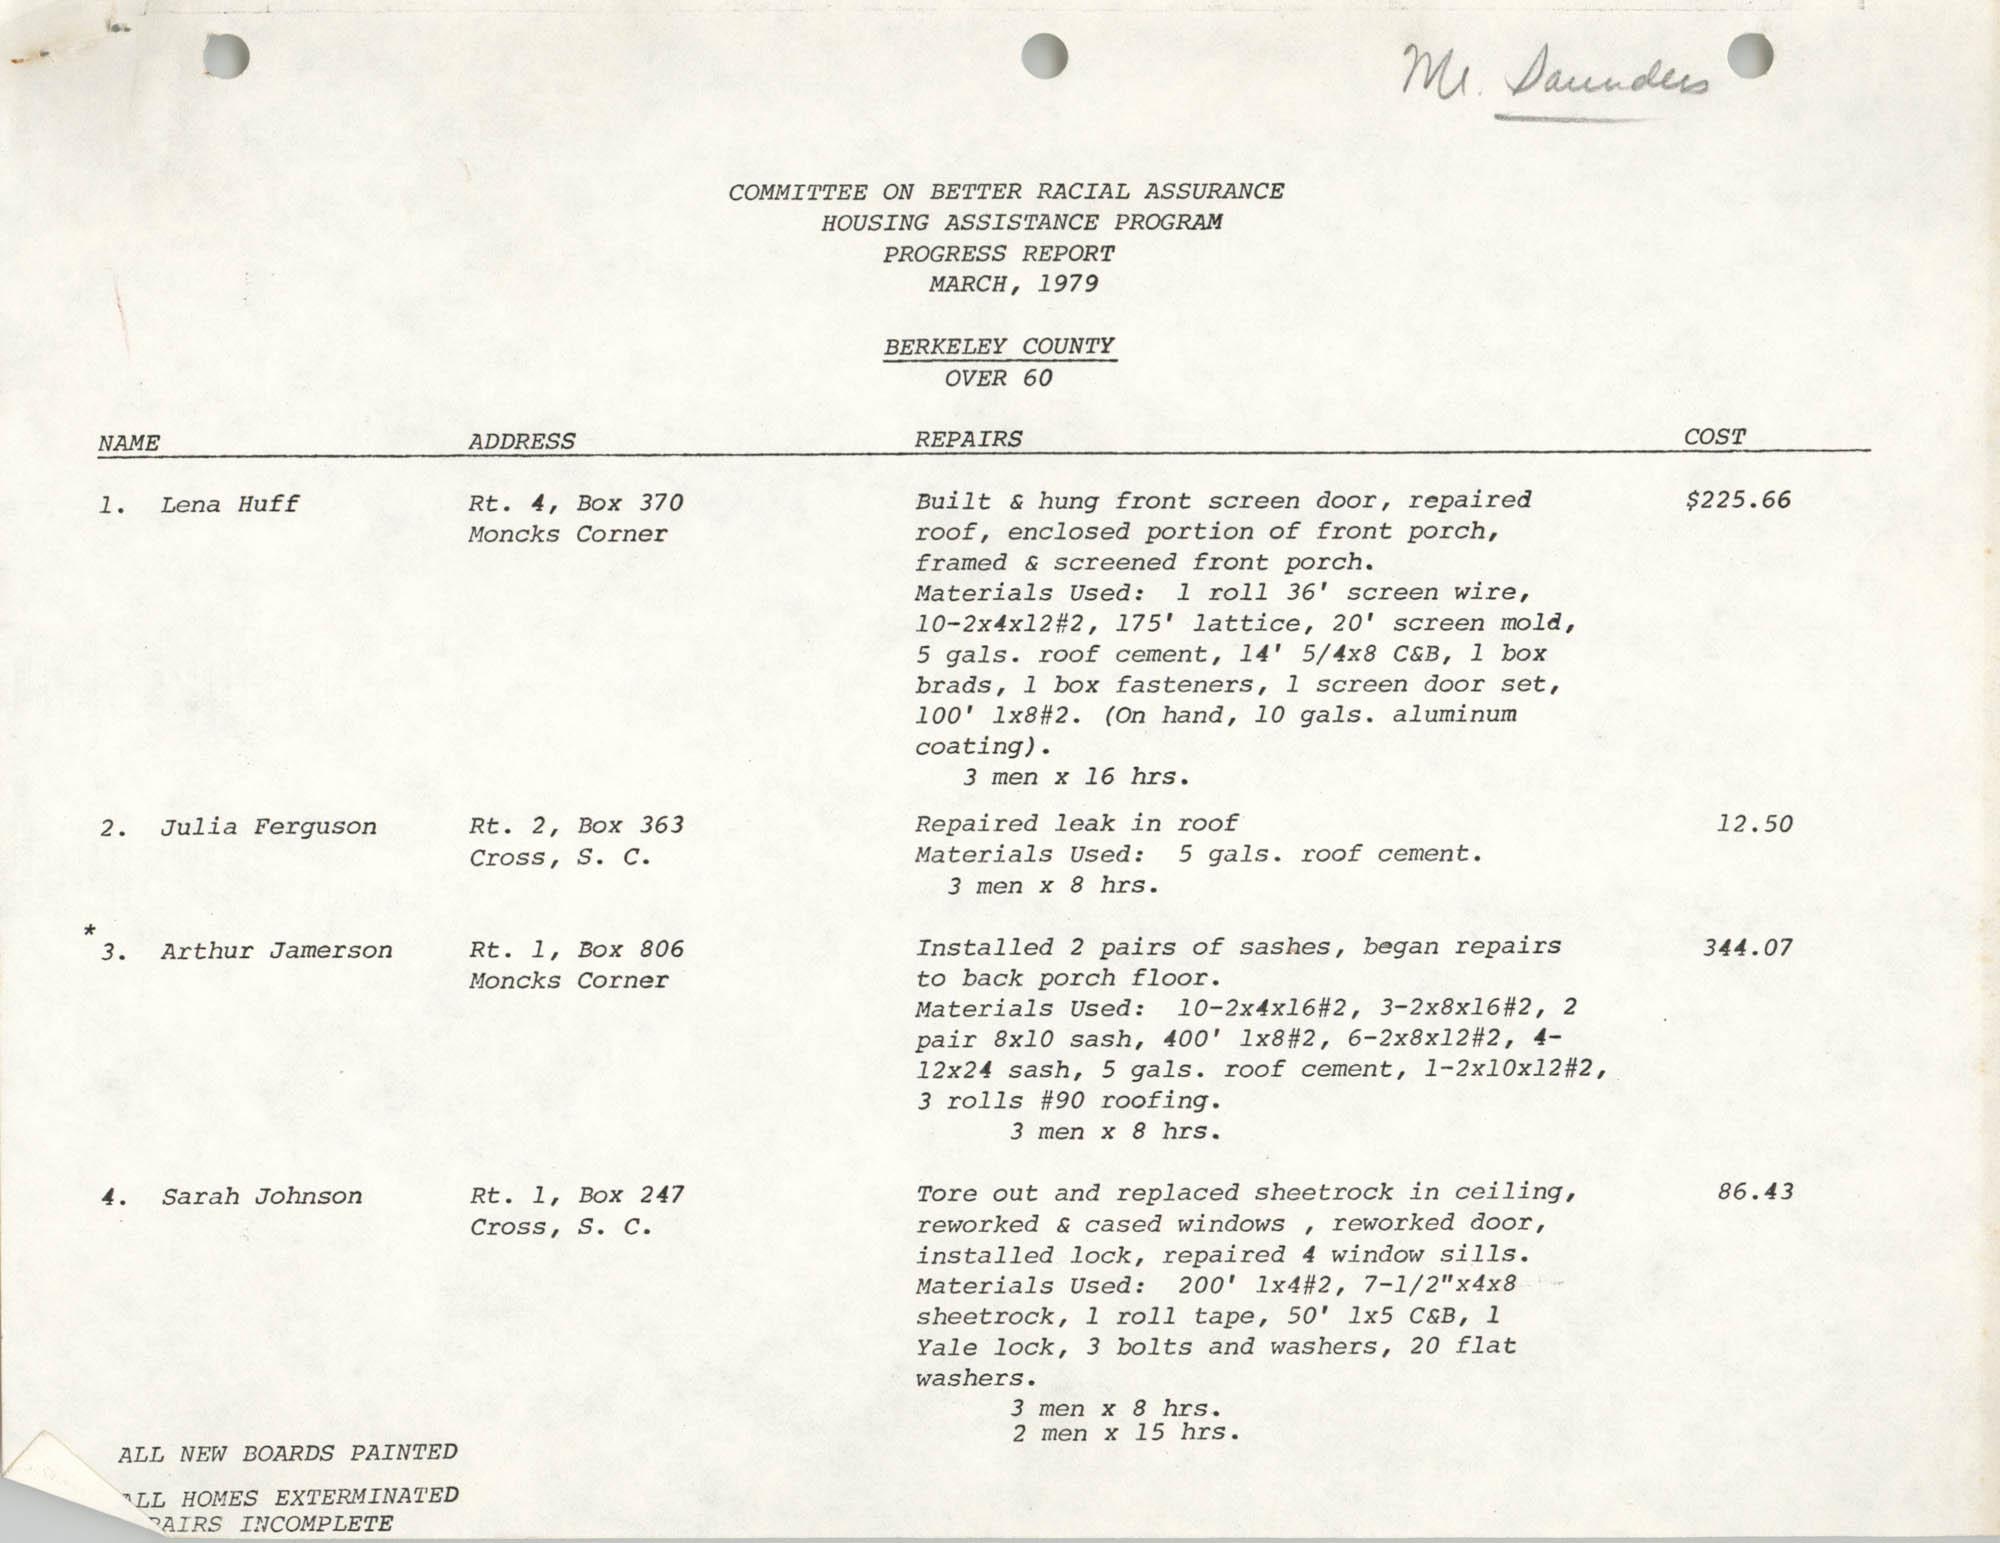 COBRA Housing Assistance Program Progress Report, March 1979